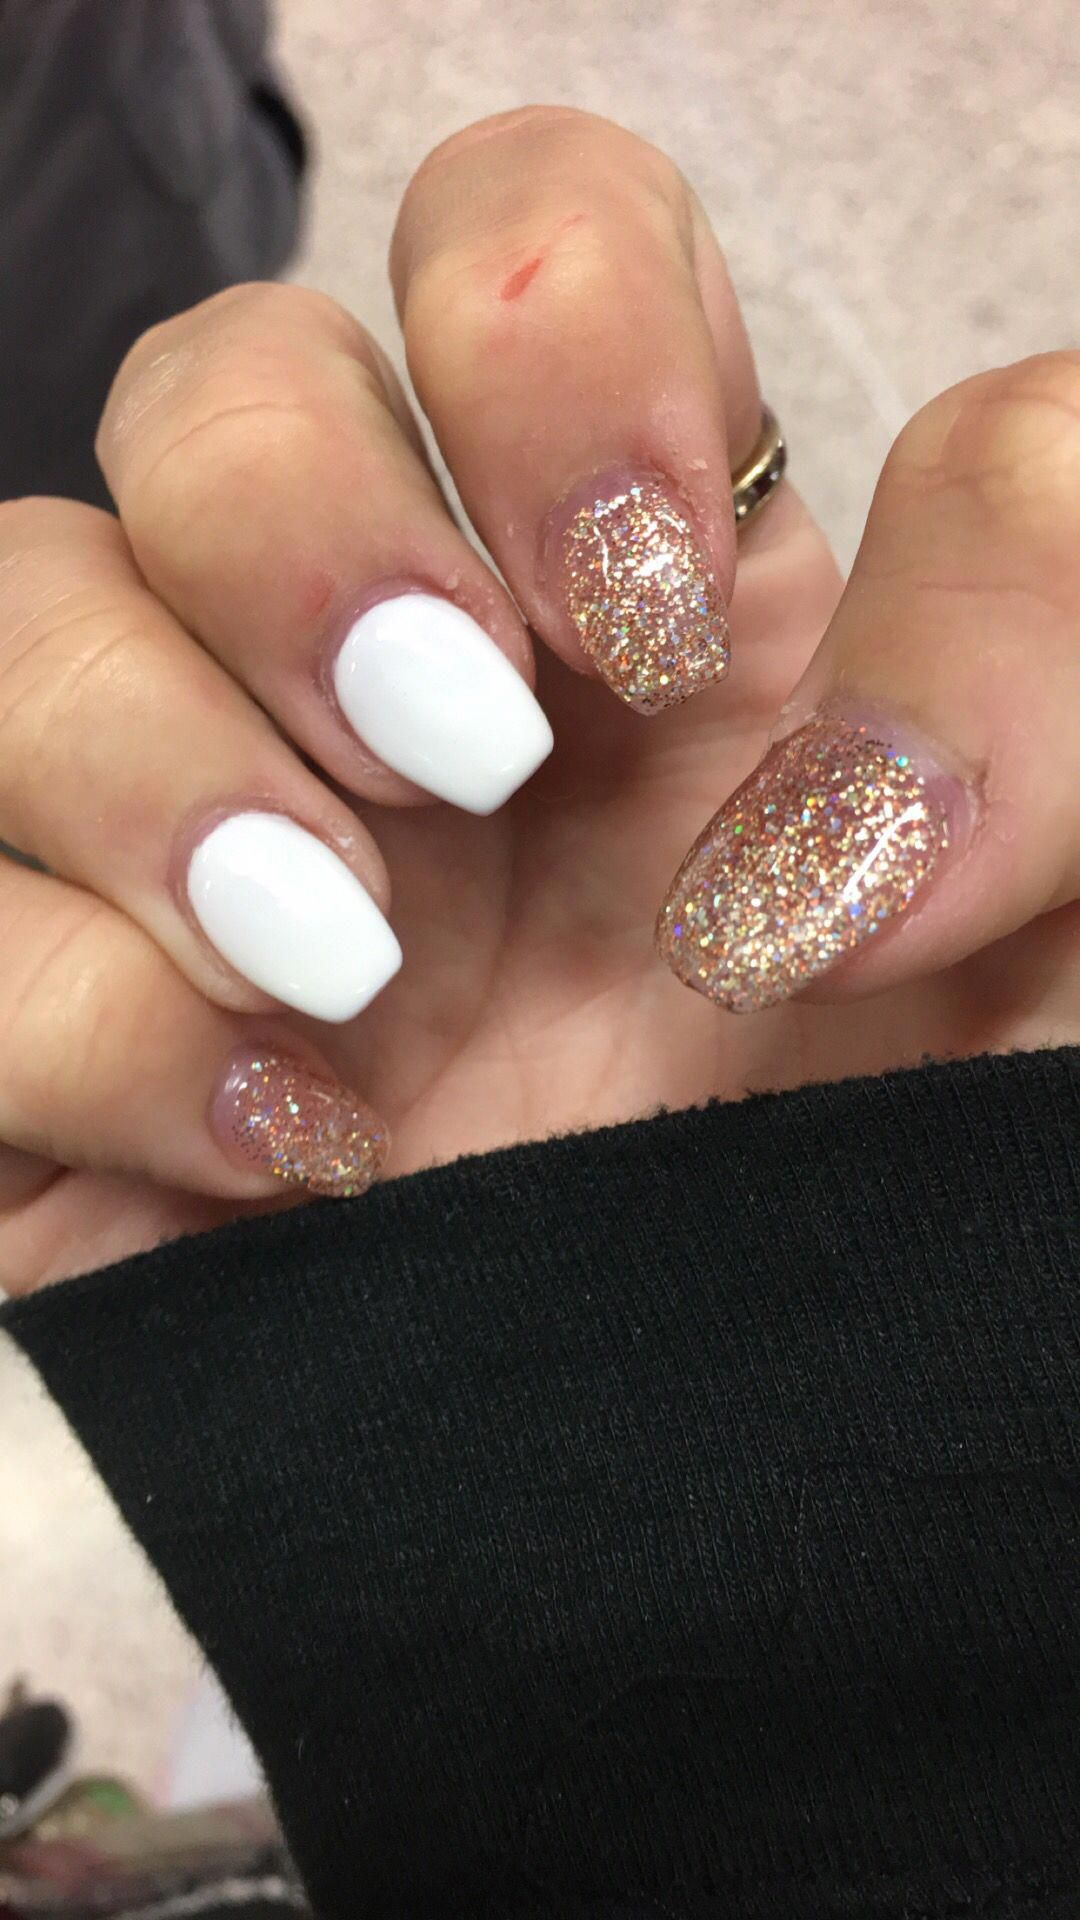 Short Coffin Nails With Glitter Gel Polish And White Acrylicnailartdesignsshort Glitter Gel Polish Short Coffin Nails Glitter Gel Nails